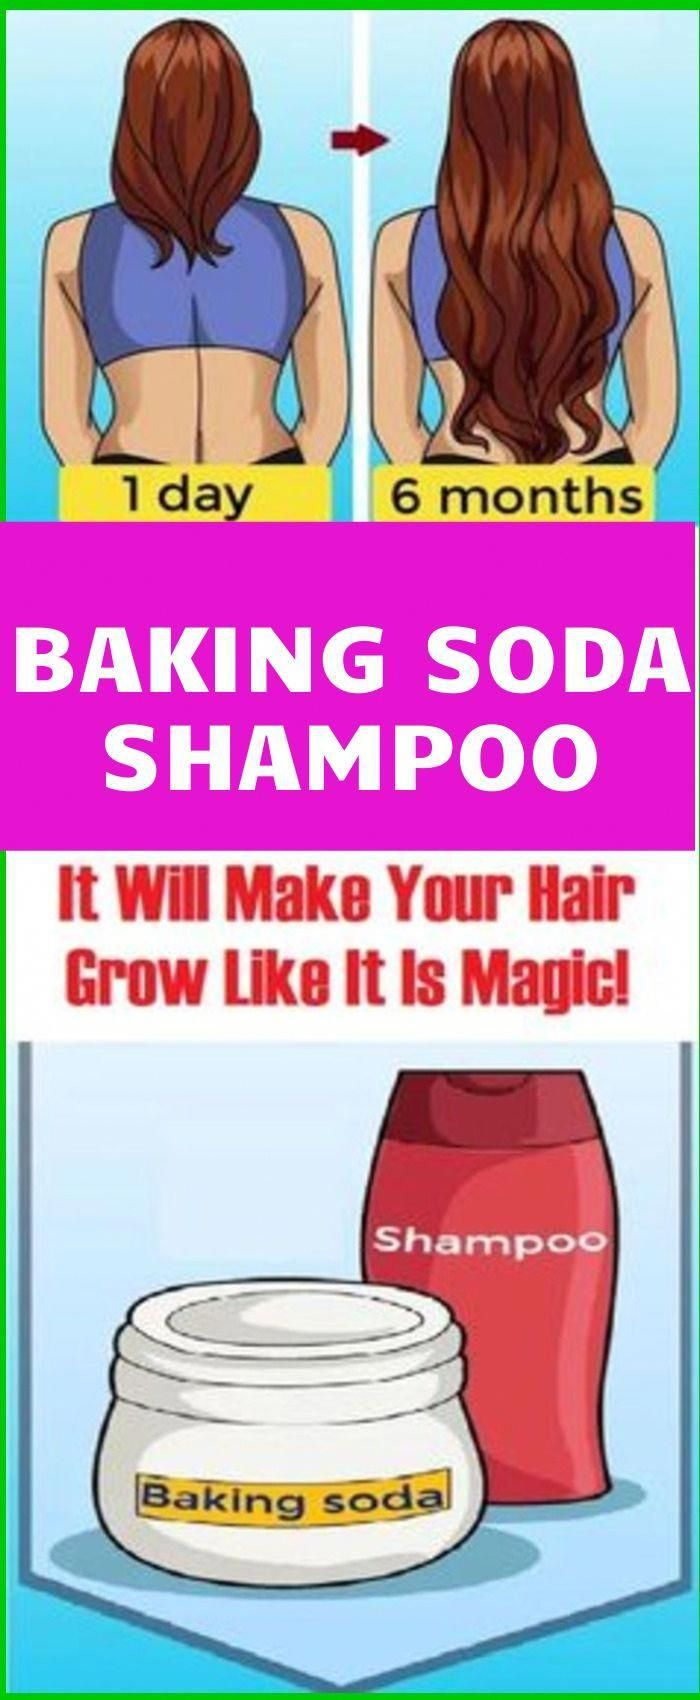 Baking Soda Shampoo: It Will Make Your Hair Grow Faster